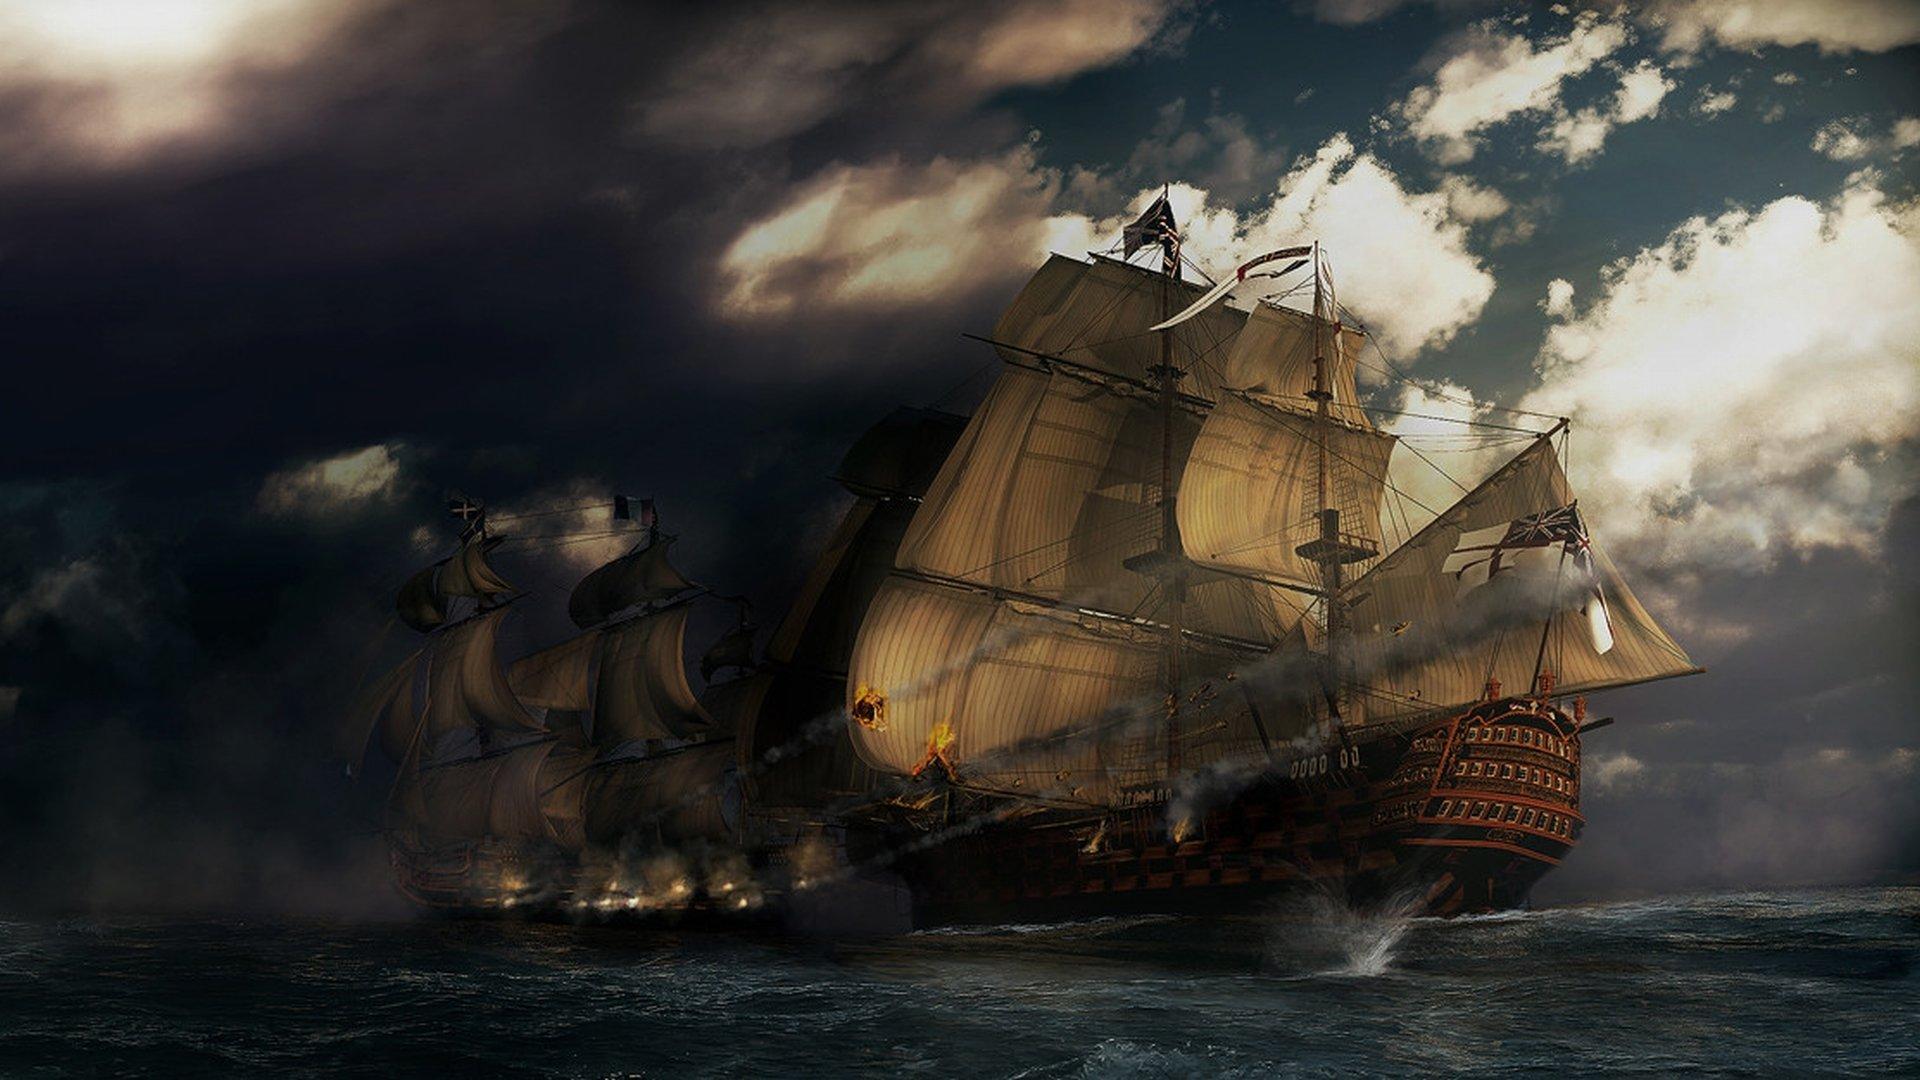 ship-background-hd-1920x1080-475026.jpg